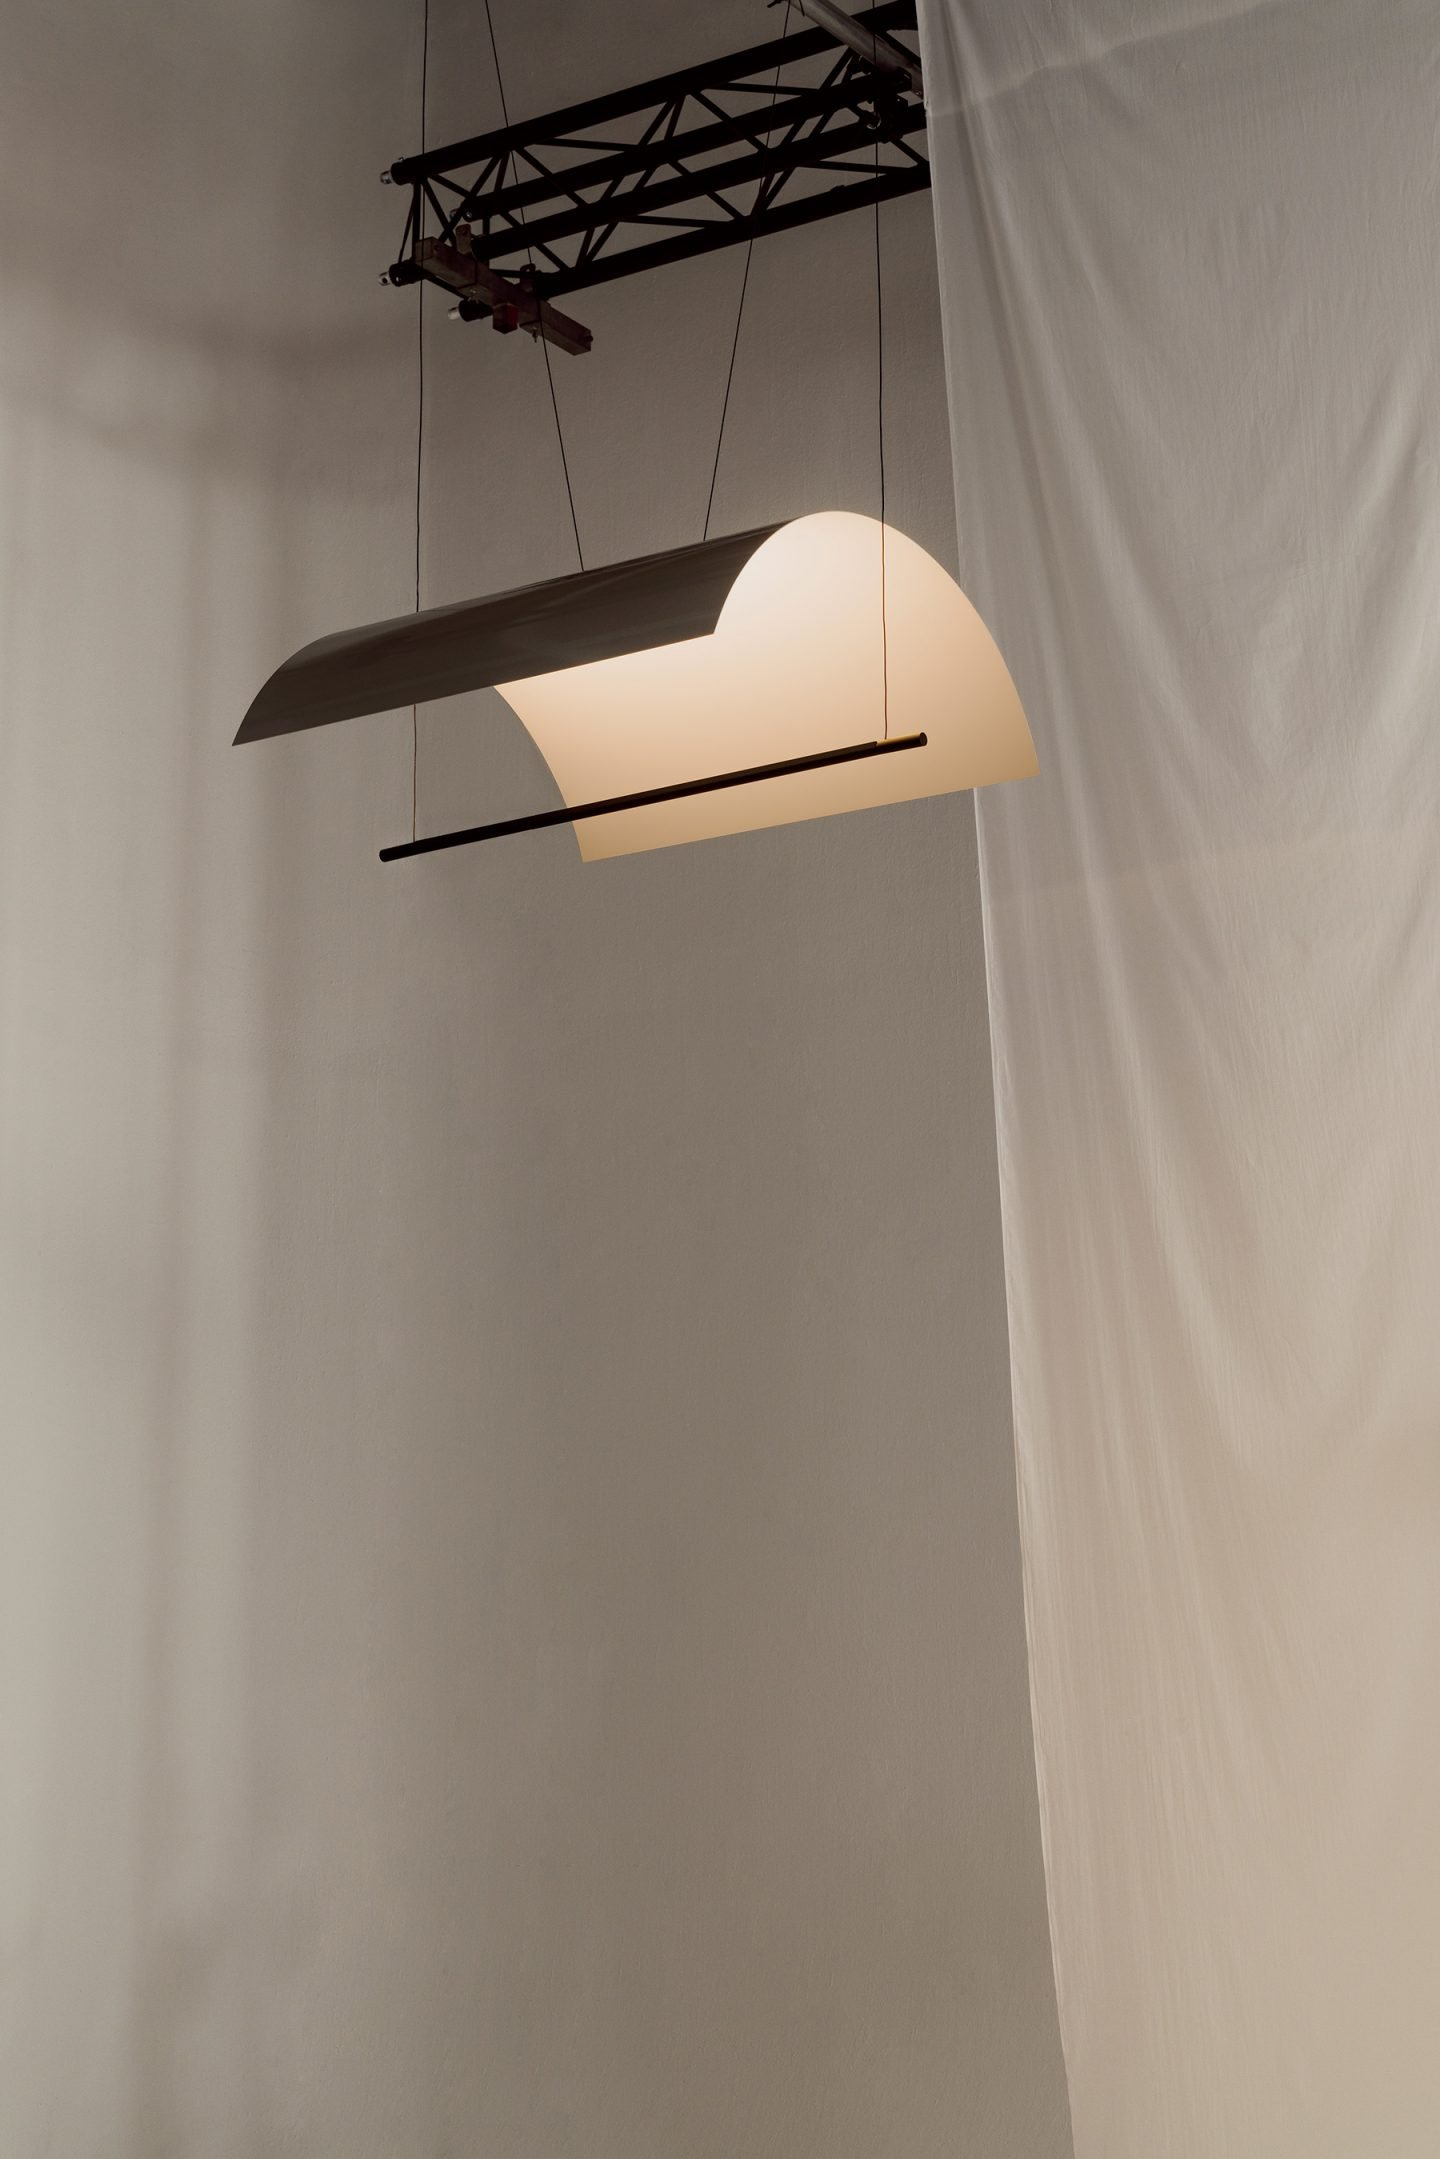 IGNANT-Design-SantaCole-AntoniArola-Lamina-13